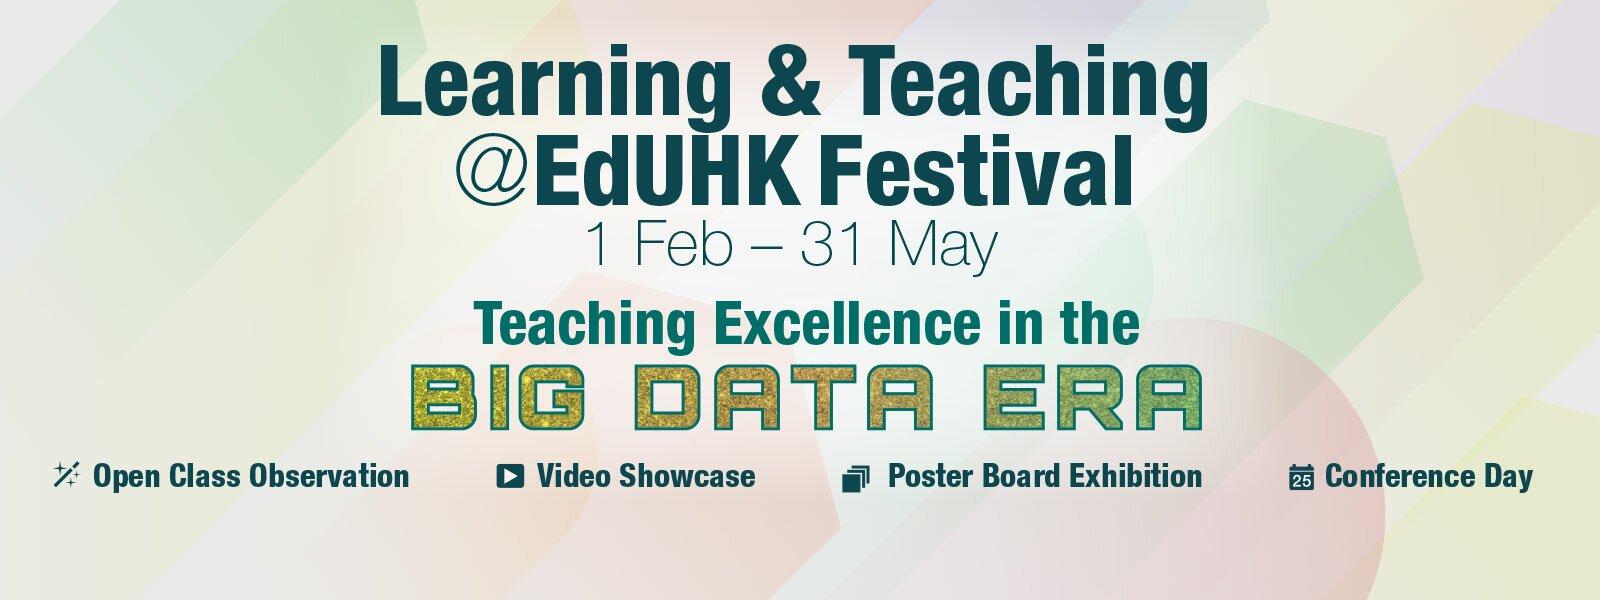 Learning and Teaching @EdUHK Festival 2018